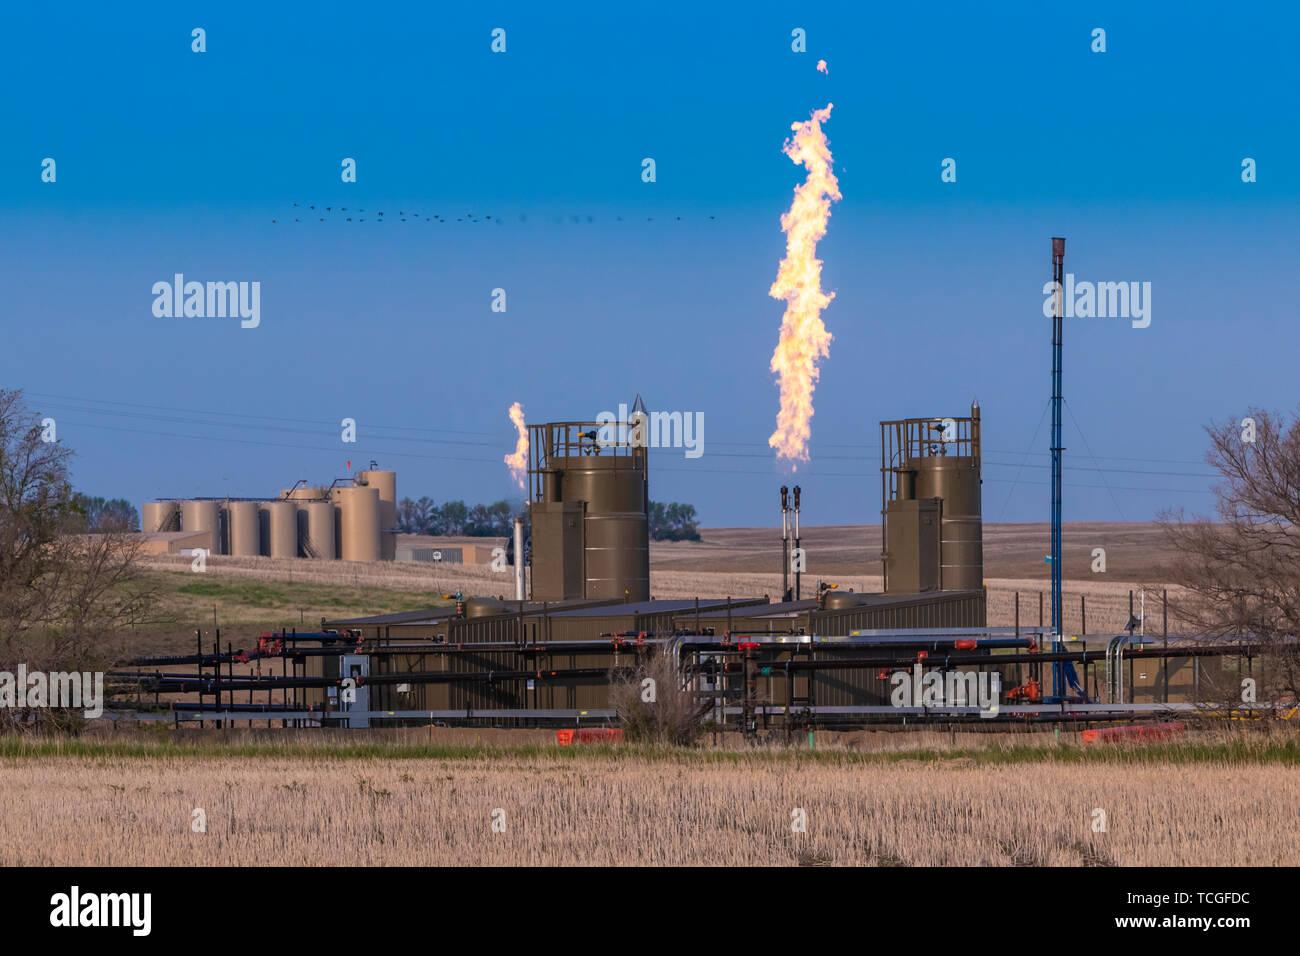 Flaring of natural gas in the Bakken Play oil fields near Williston, North Dakota, USA. - Stock Image